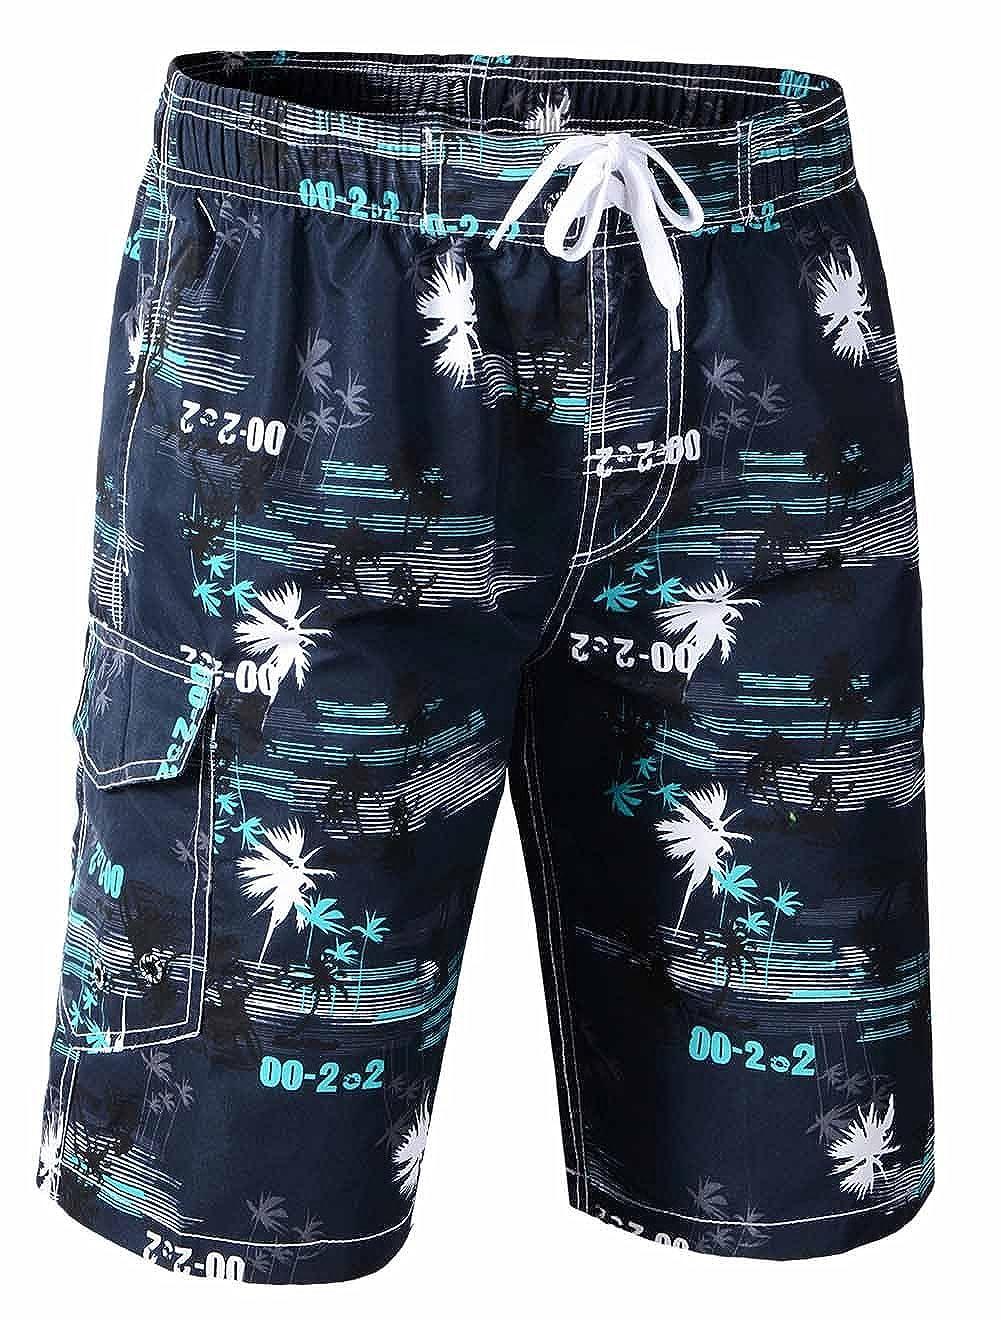 Tuopuda Men's Swim Shorts Palm Printed Quick Dry Board Shorts Beach Swimwear